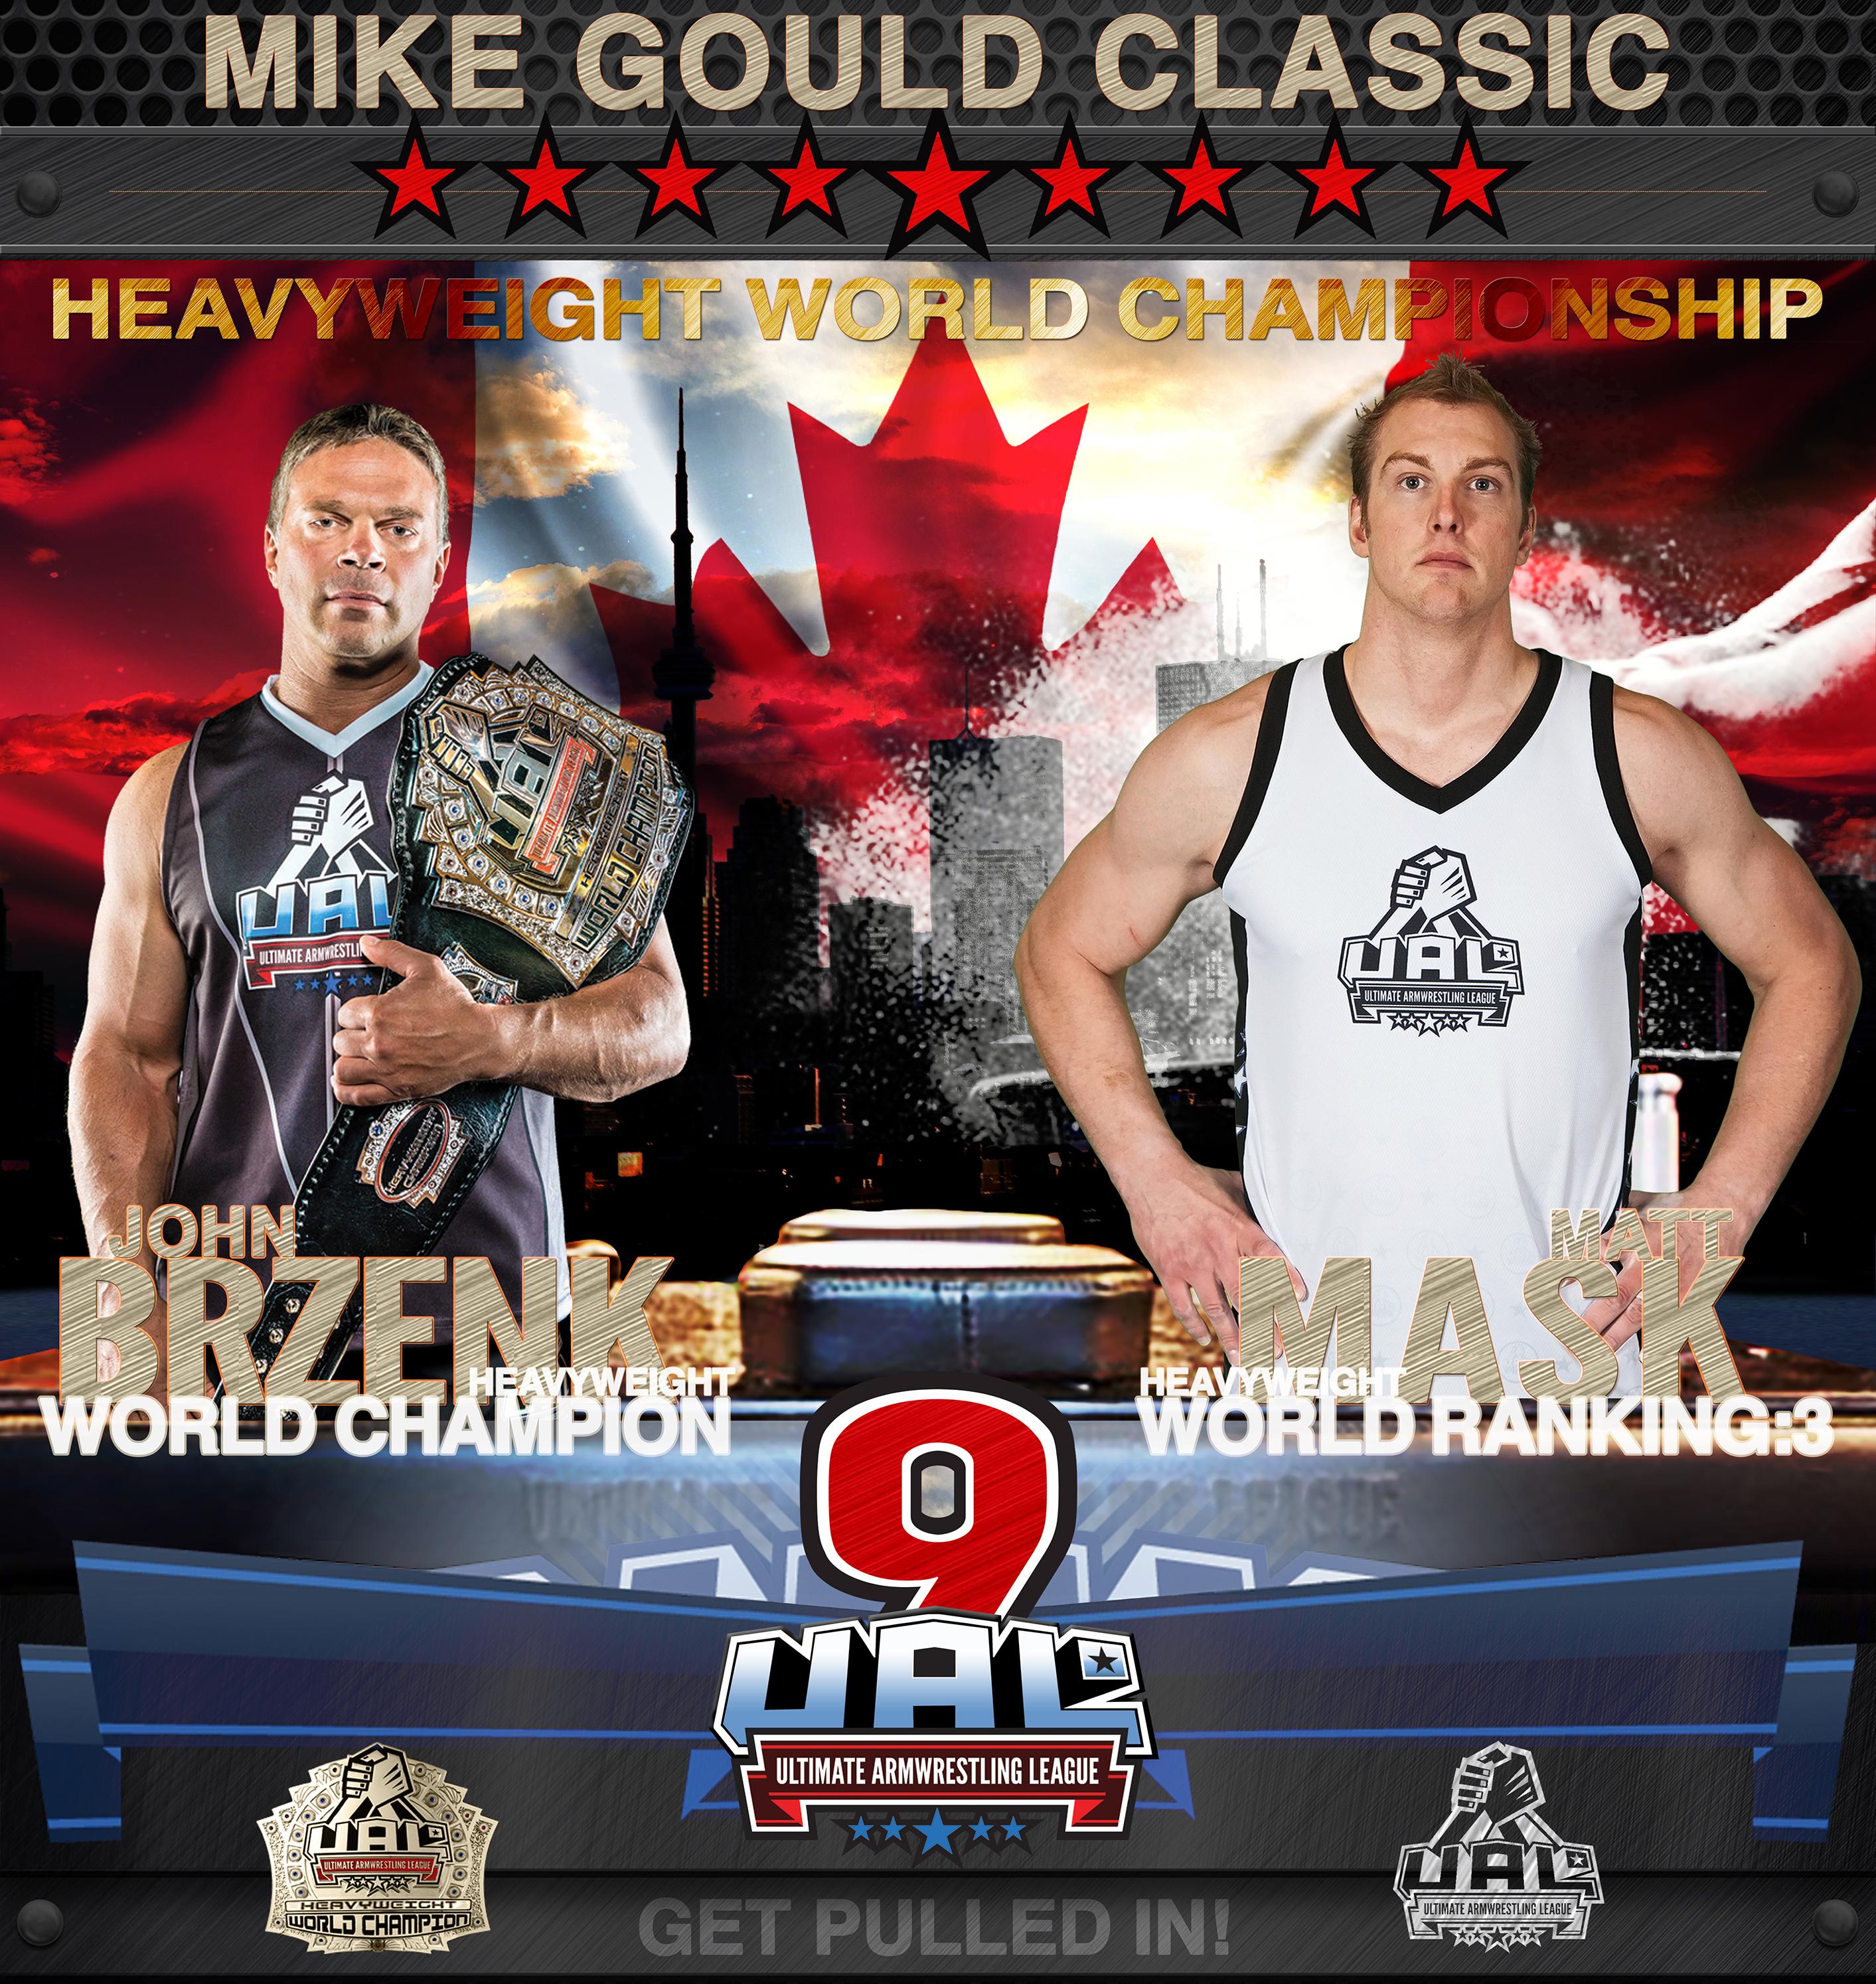 John Brzenk vs. Matt Mask, UAL 9 - 2015 MIKE GOULD CLASSIC │ Image Source: theual.com